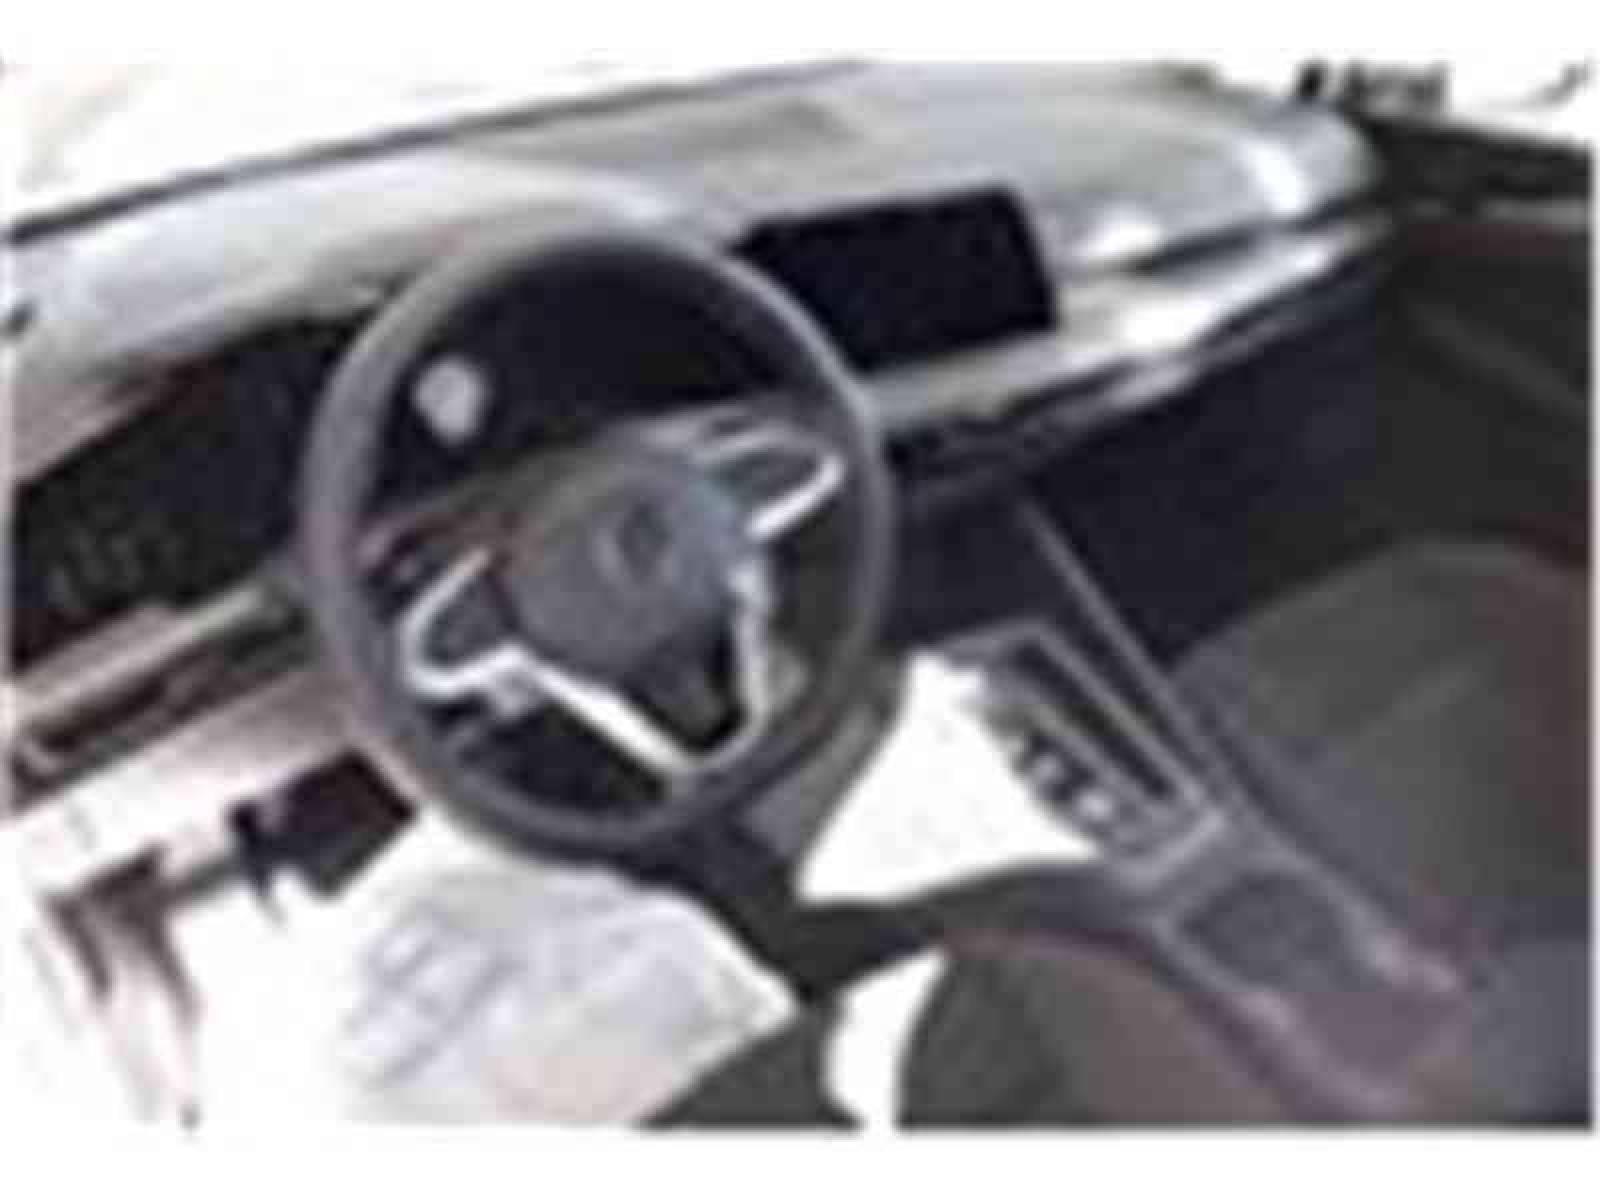 VOLKSWAGEN Golf 1.5 eTSI OPF 150 DSG7 - véhicule neuf - LEMAUVIEL AUTOMOBILES - Présentation site web V2 - Lemauviel automobiles - FLERS - 61100 - FLERS - 3